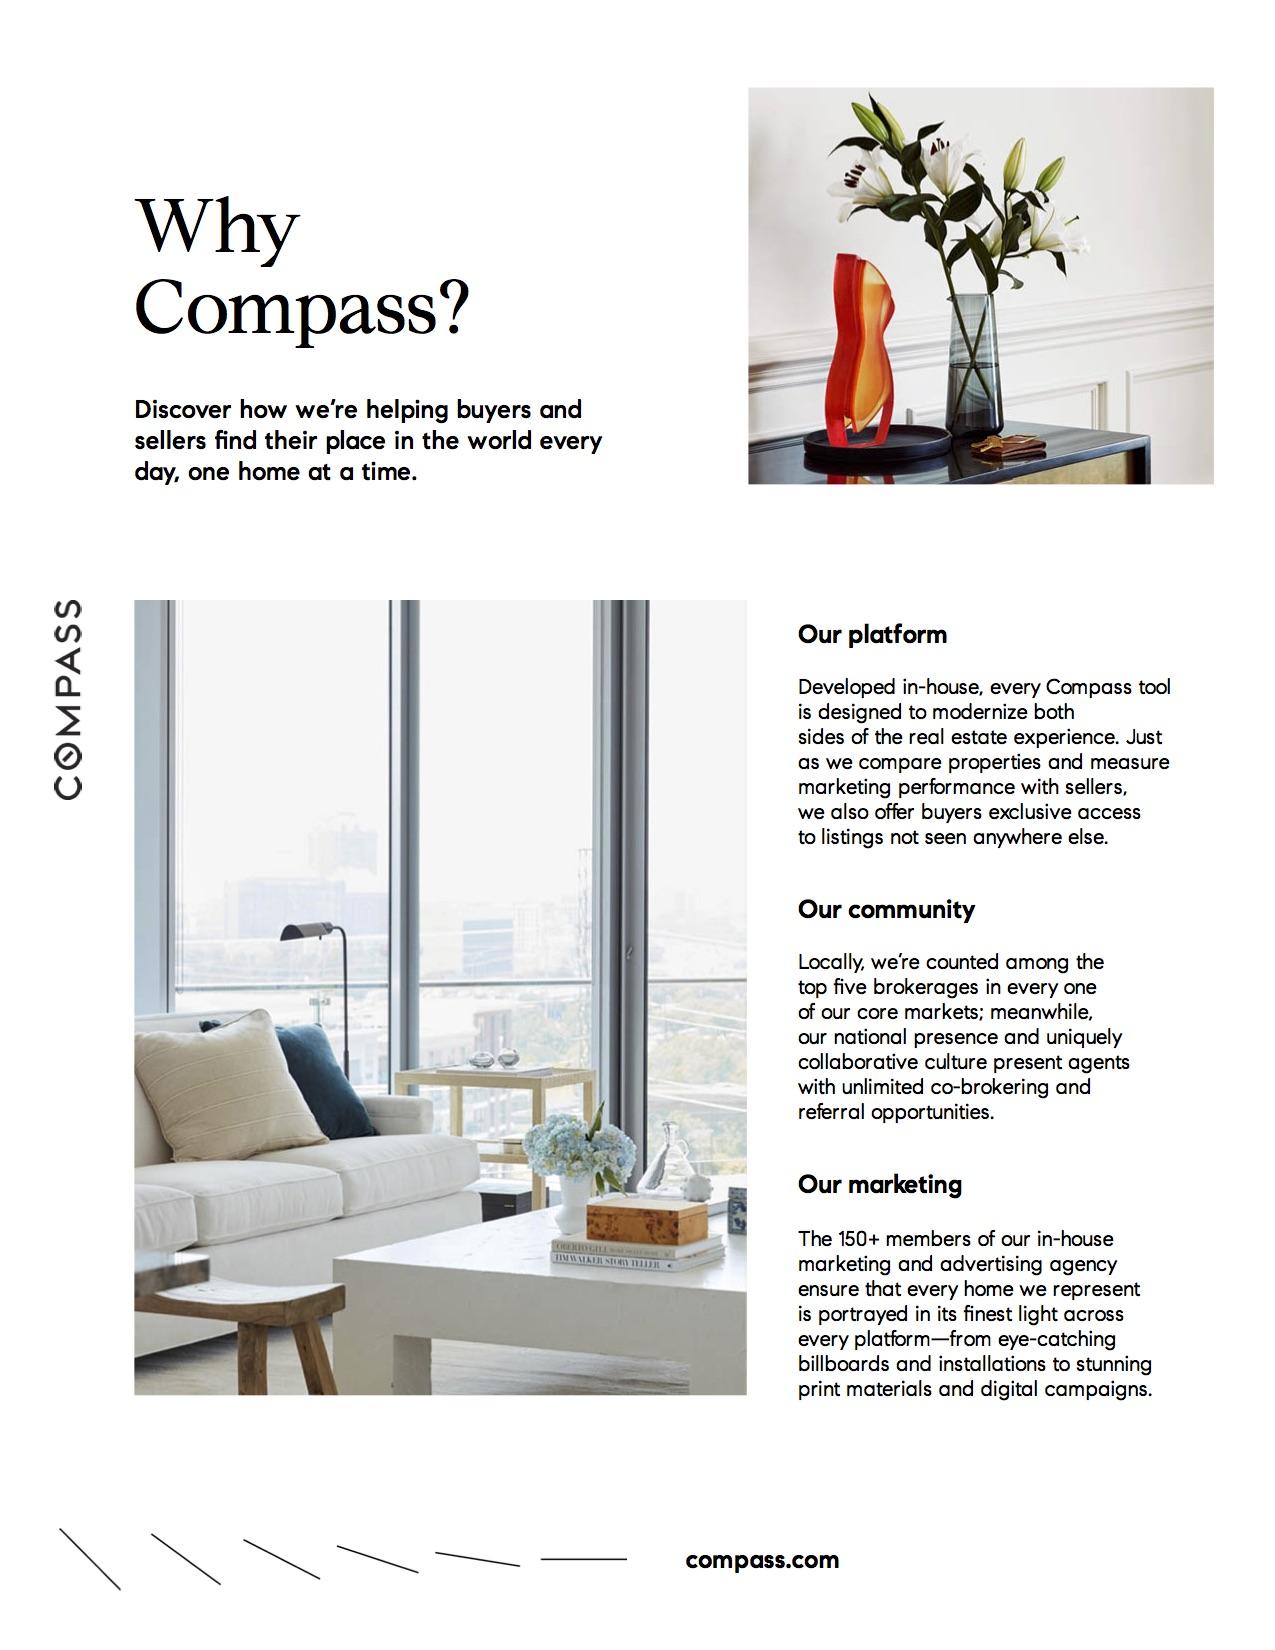 Why-Choose-Compass-2019.06.25-05.20.17.jpg